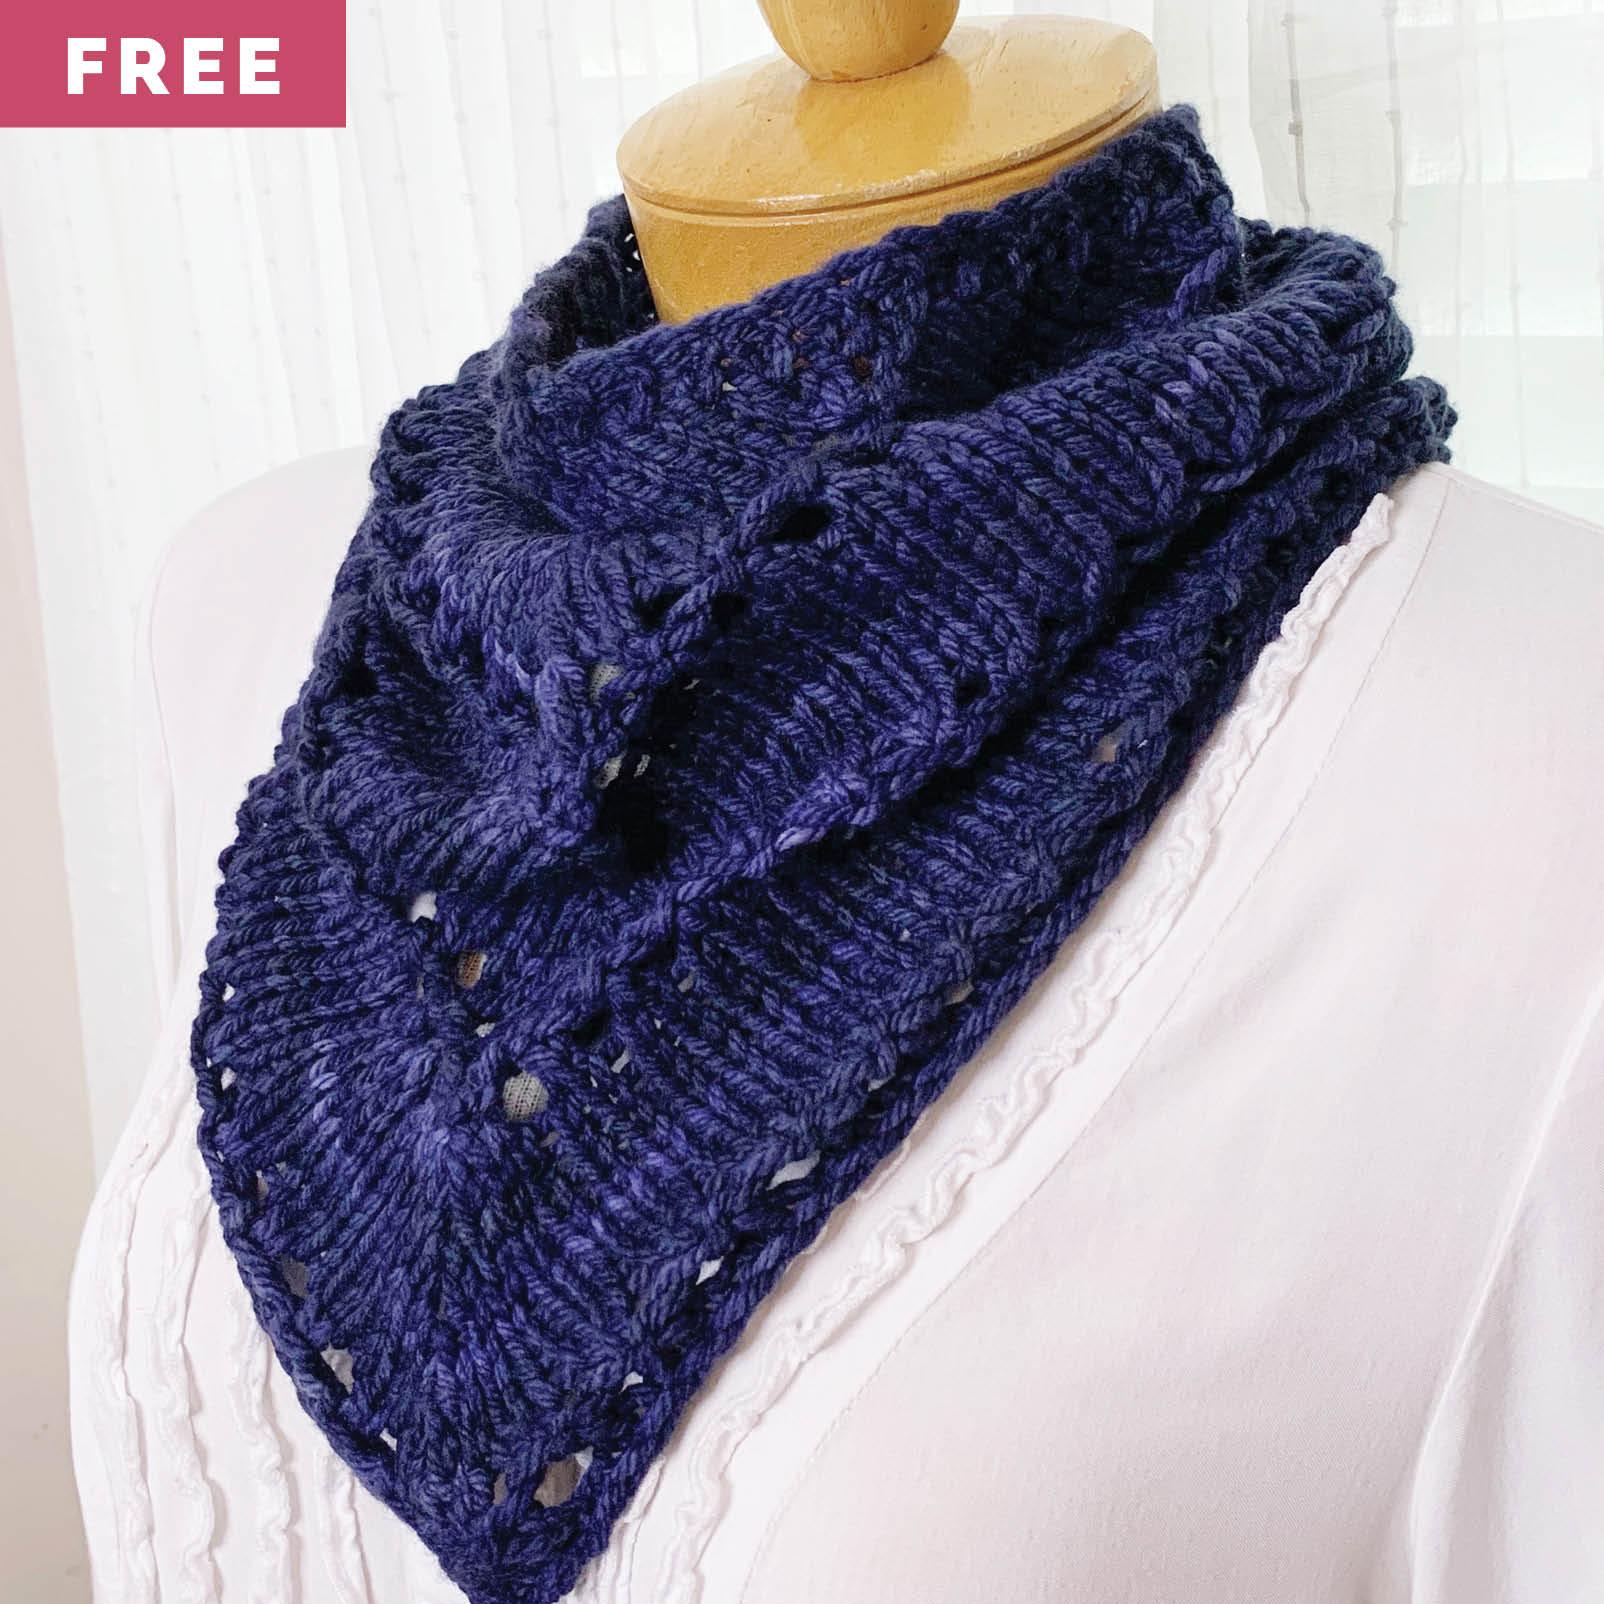 Free Knitting Pattern - Chunky Eyelet Cowlette